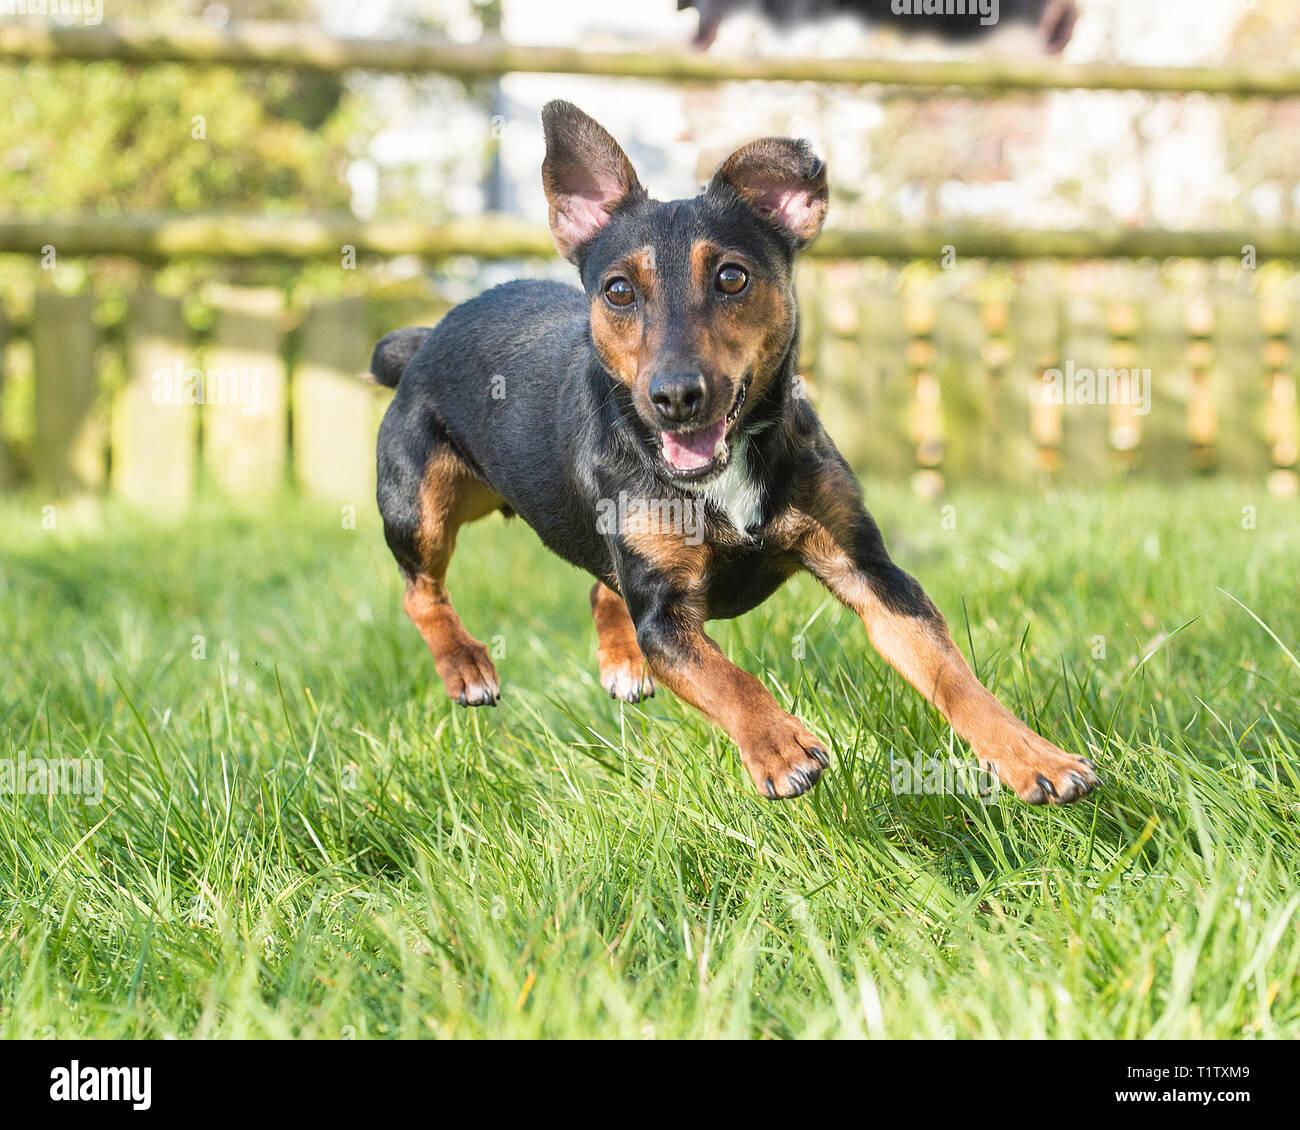 black and tan Irish Terrier - Stock Image